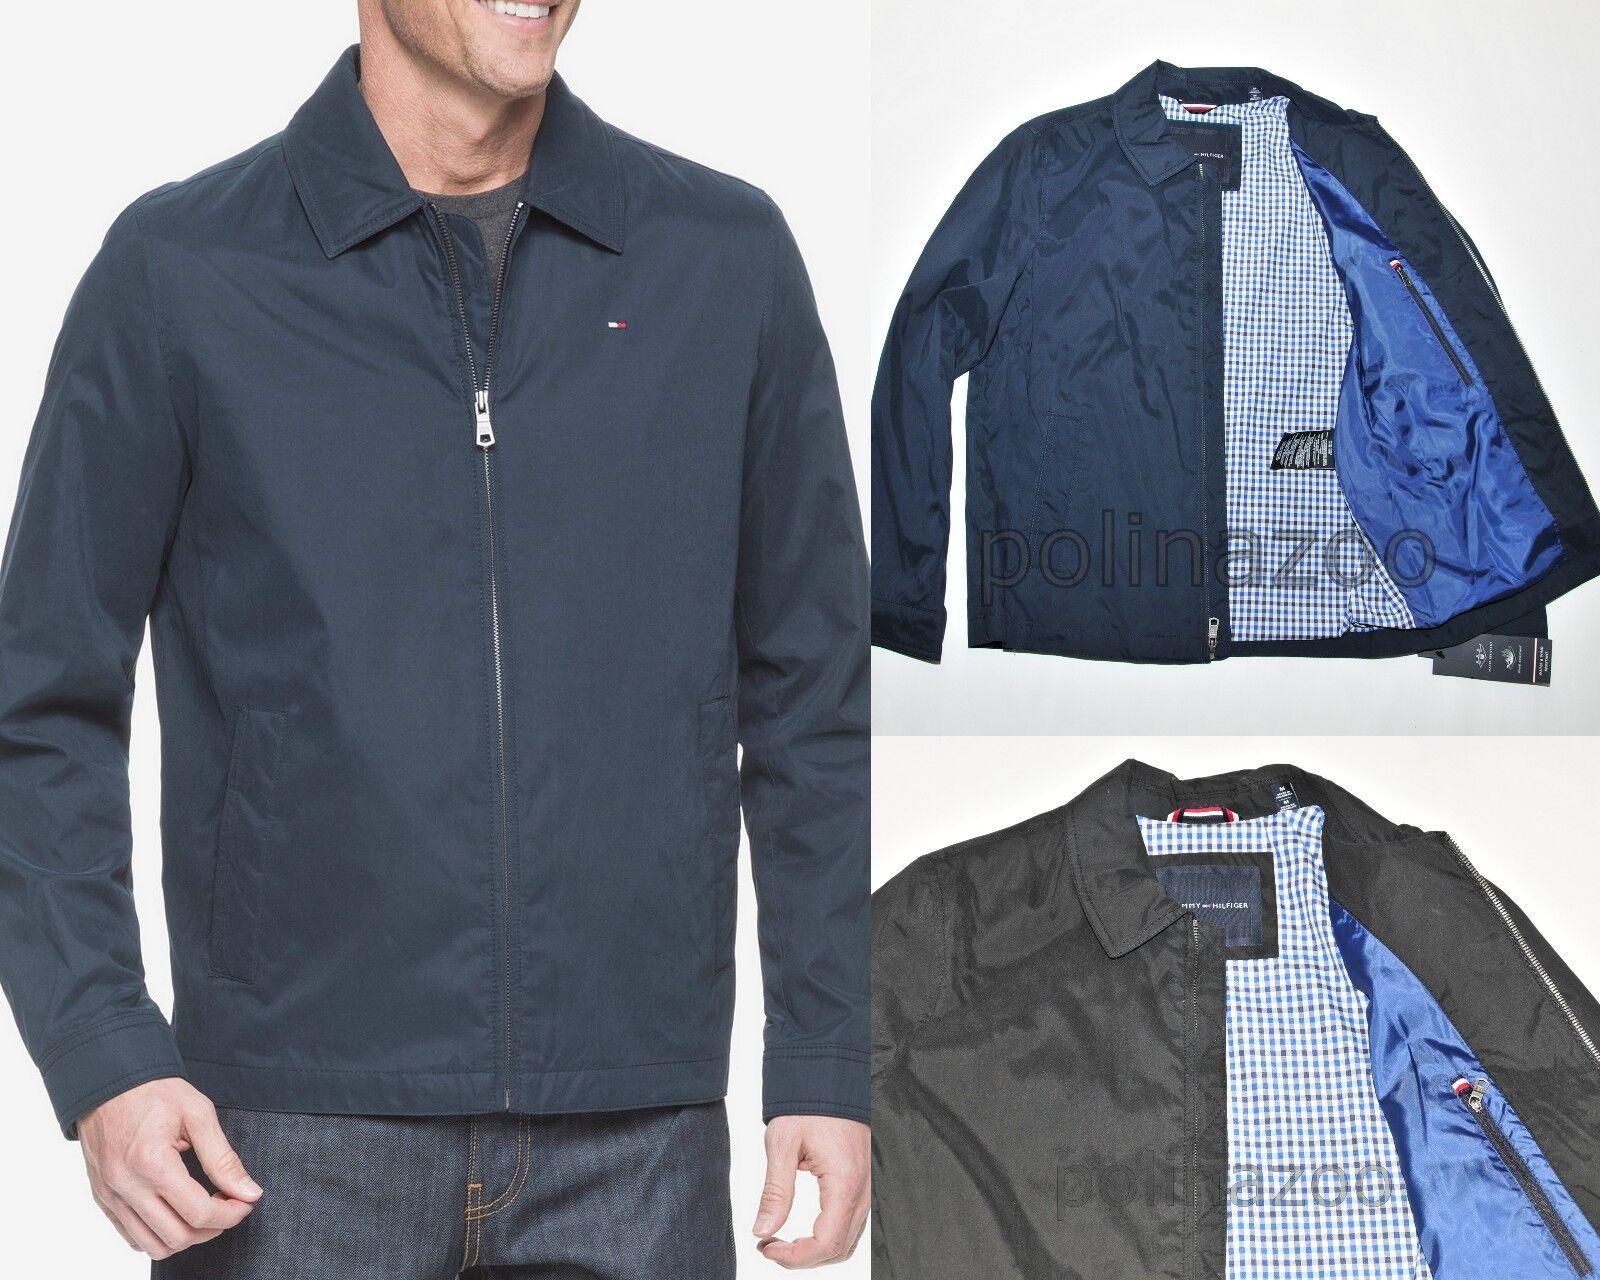 Tommy Hilfiger Men's Lightweight Full Zip Jacket Black Navy